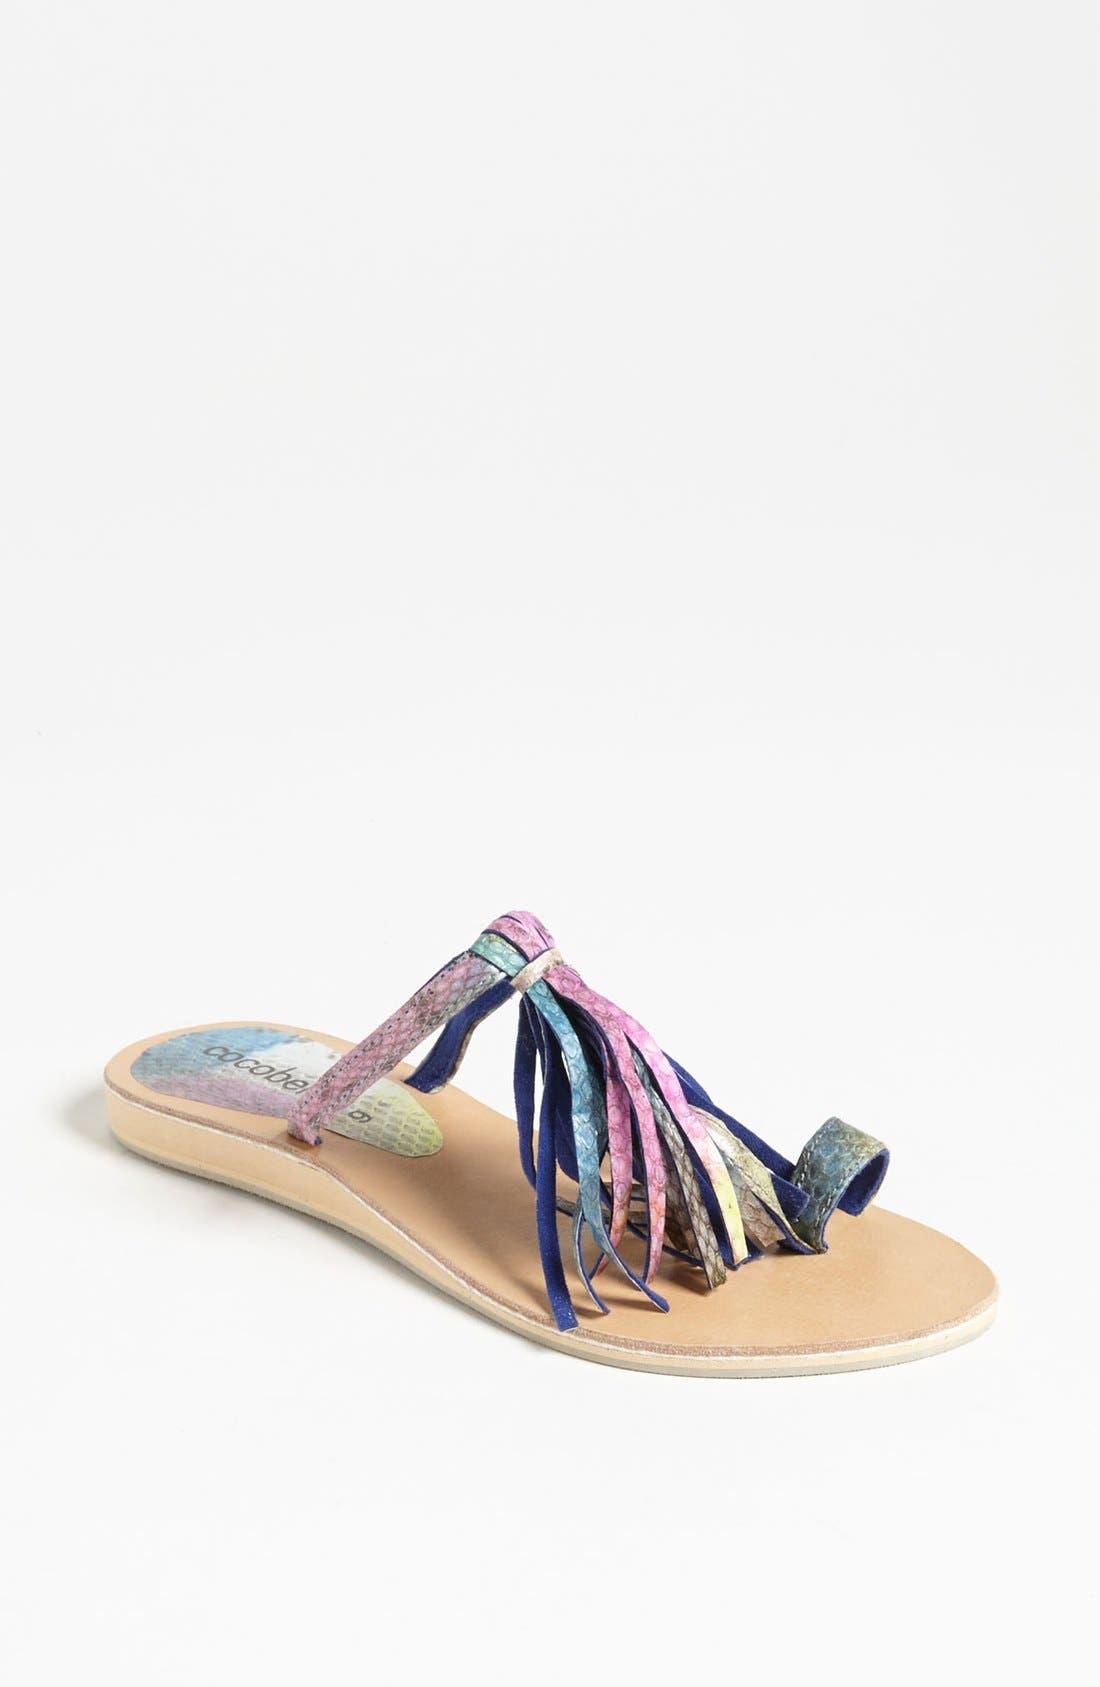 Alternate Image 1 Selected - Cocobelle Fringe Sandal